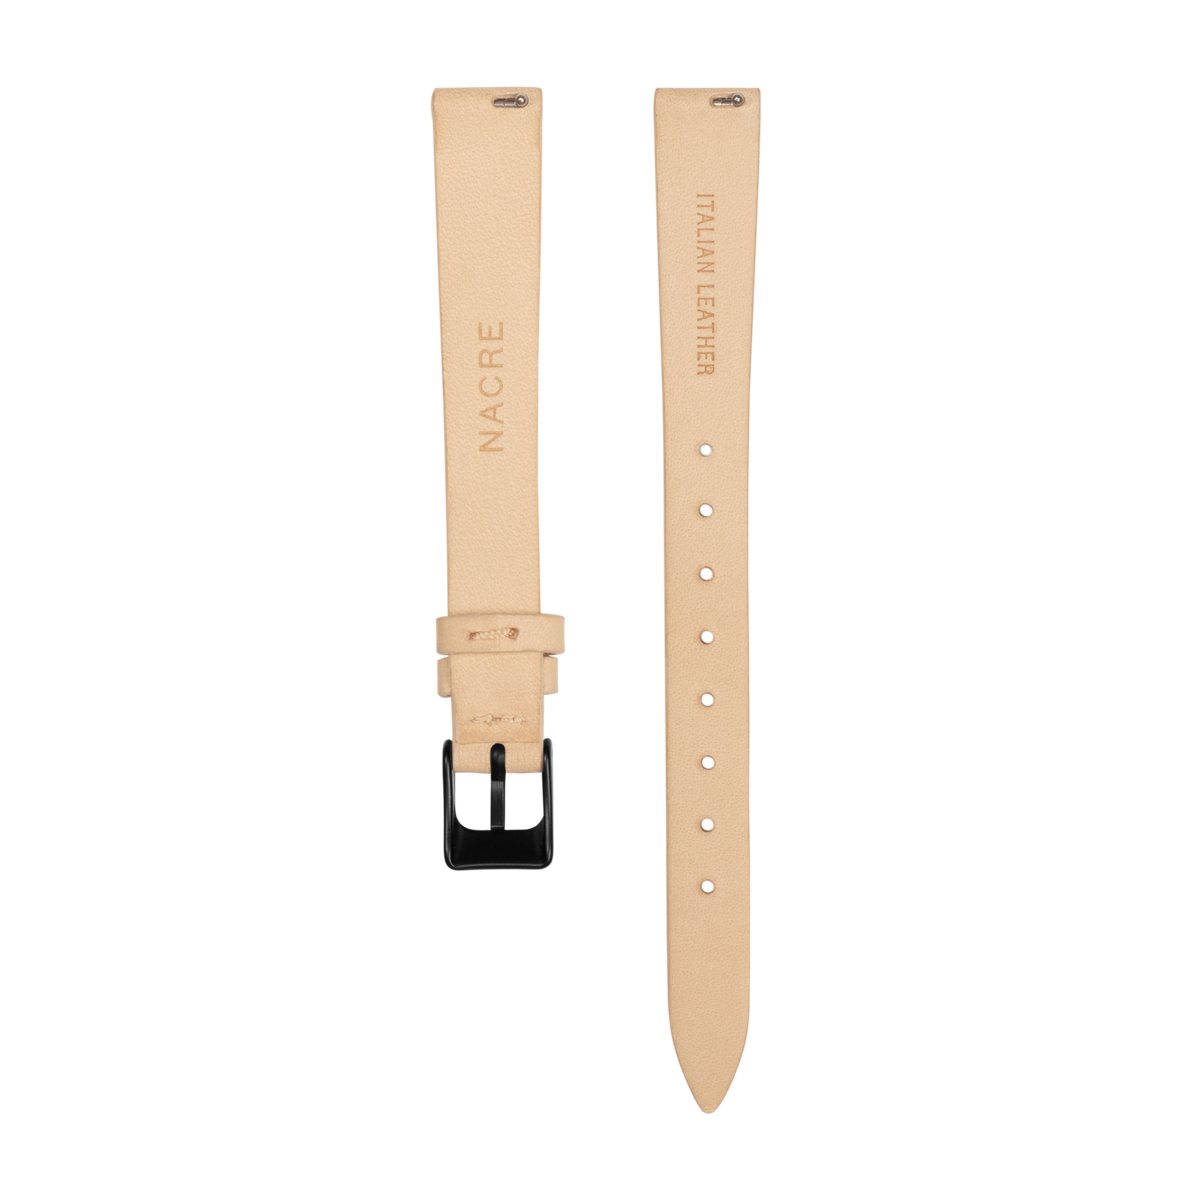 Strap - Italian Leather - Sand Leather - Matte Black - 12mm